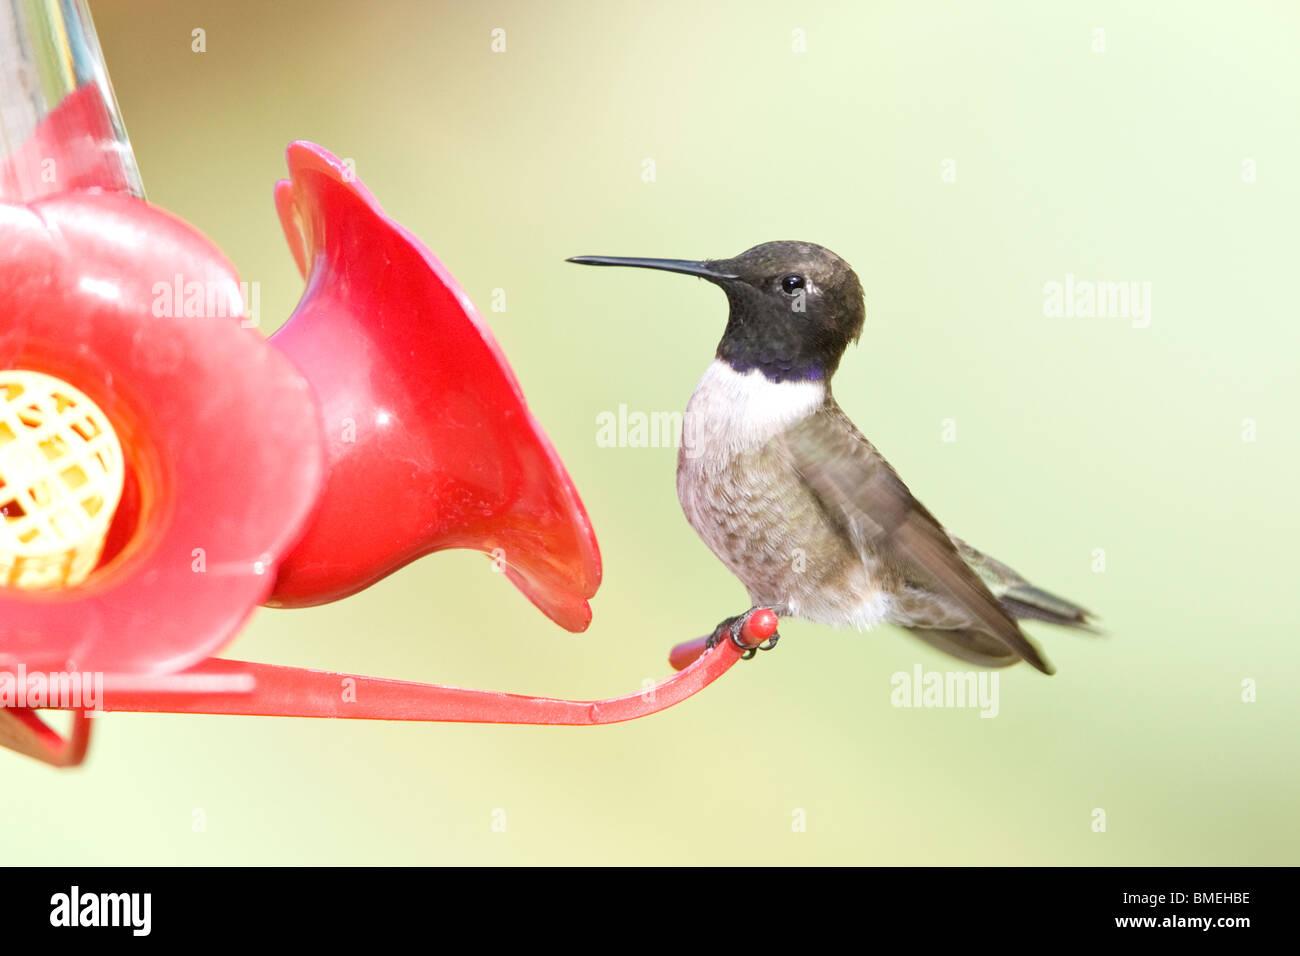 Black-chinned Hummingbird on Feeder - Stock Image